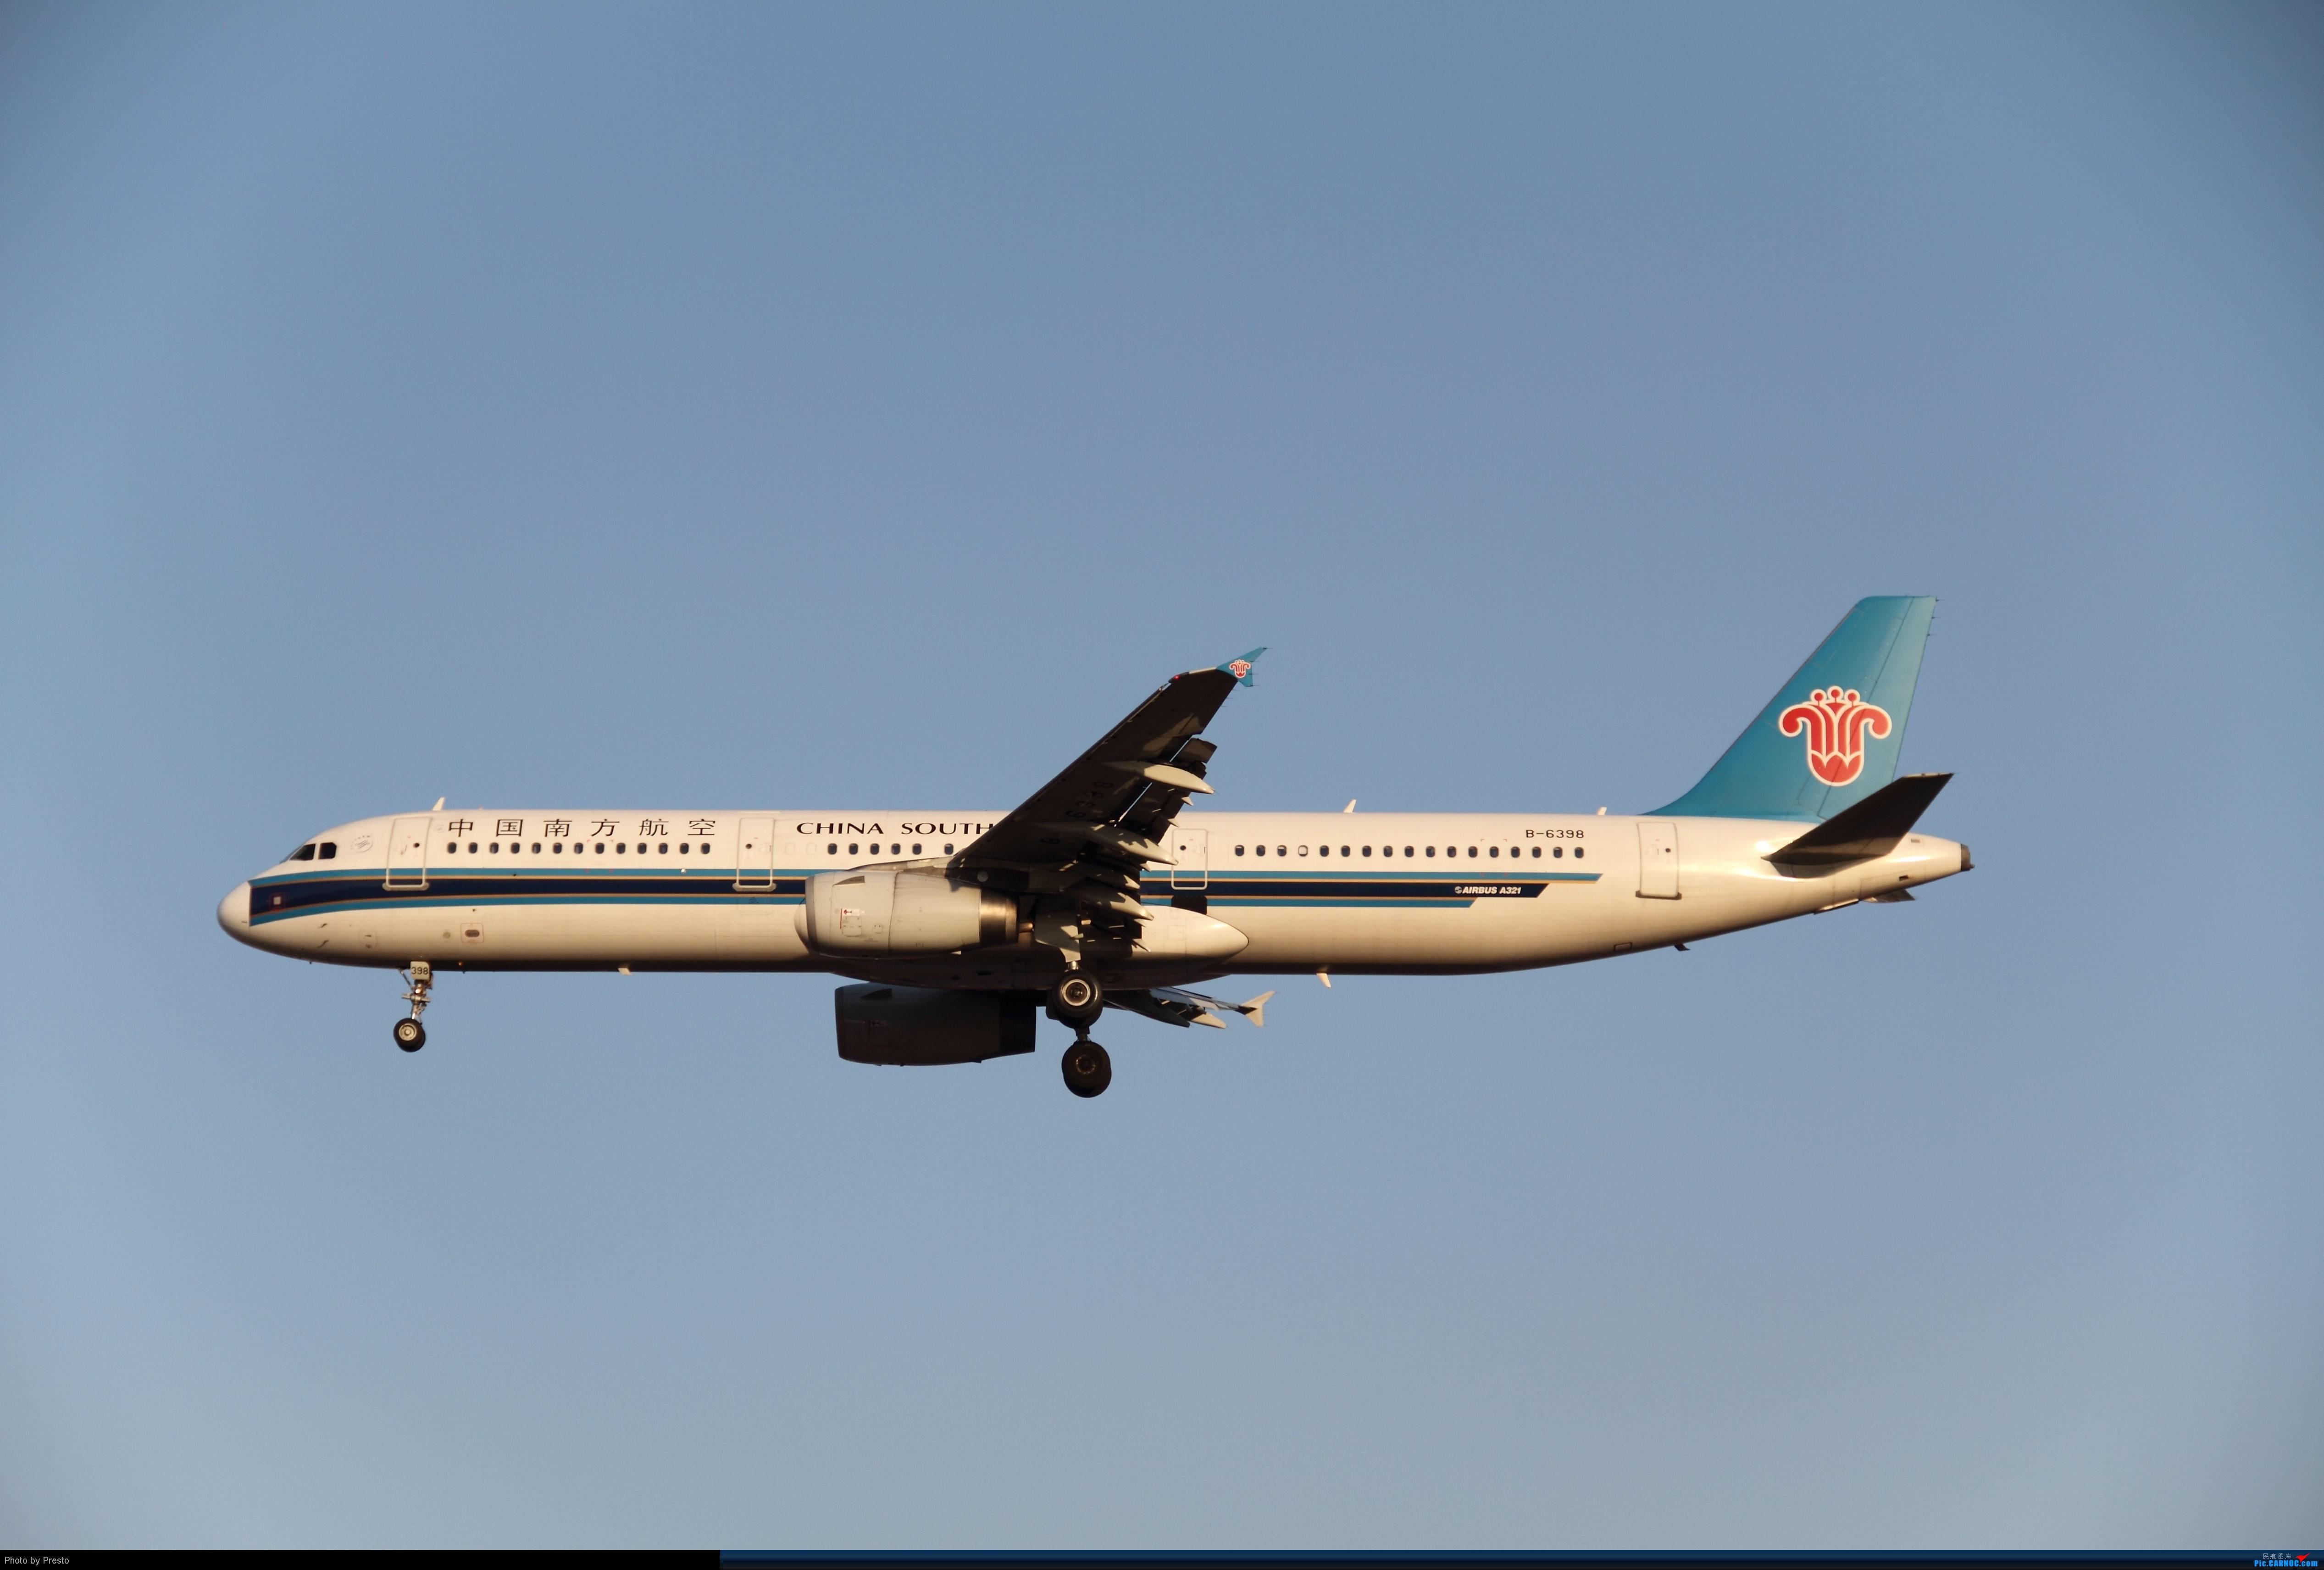 Re:[原创]2.2PEK 首次发图 虚心求教 AIRBUS A321-200 B-6398 中国北京首都机场